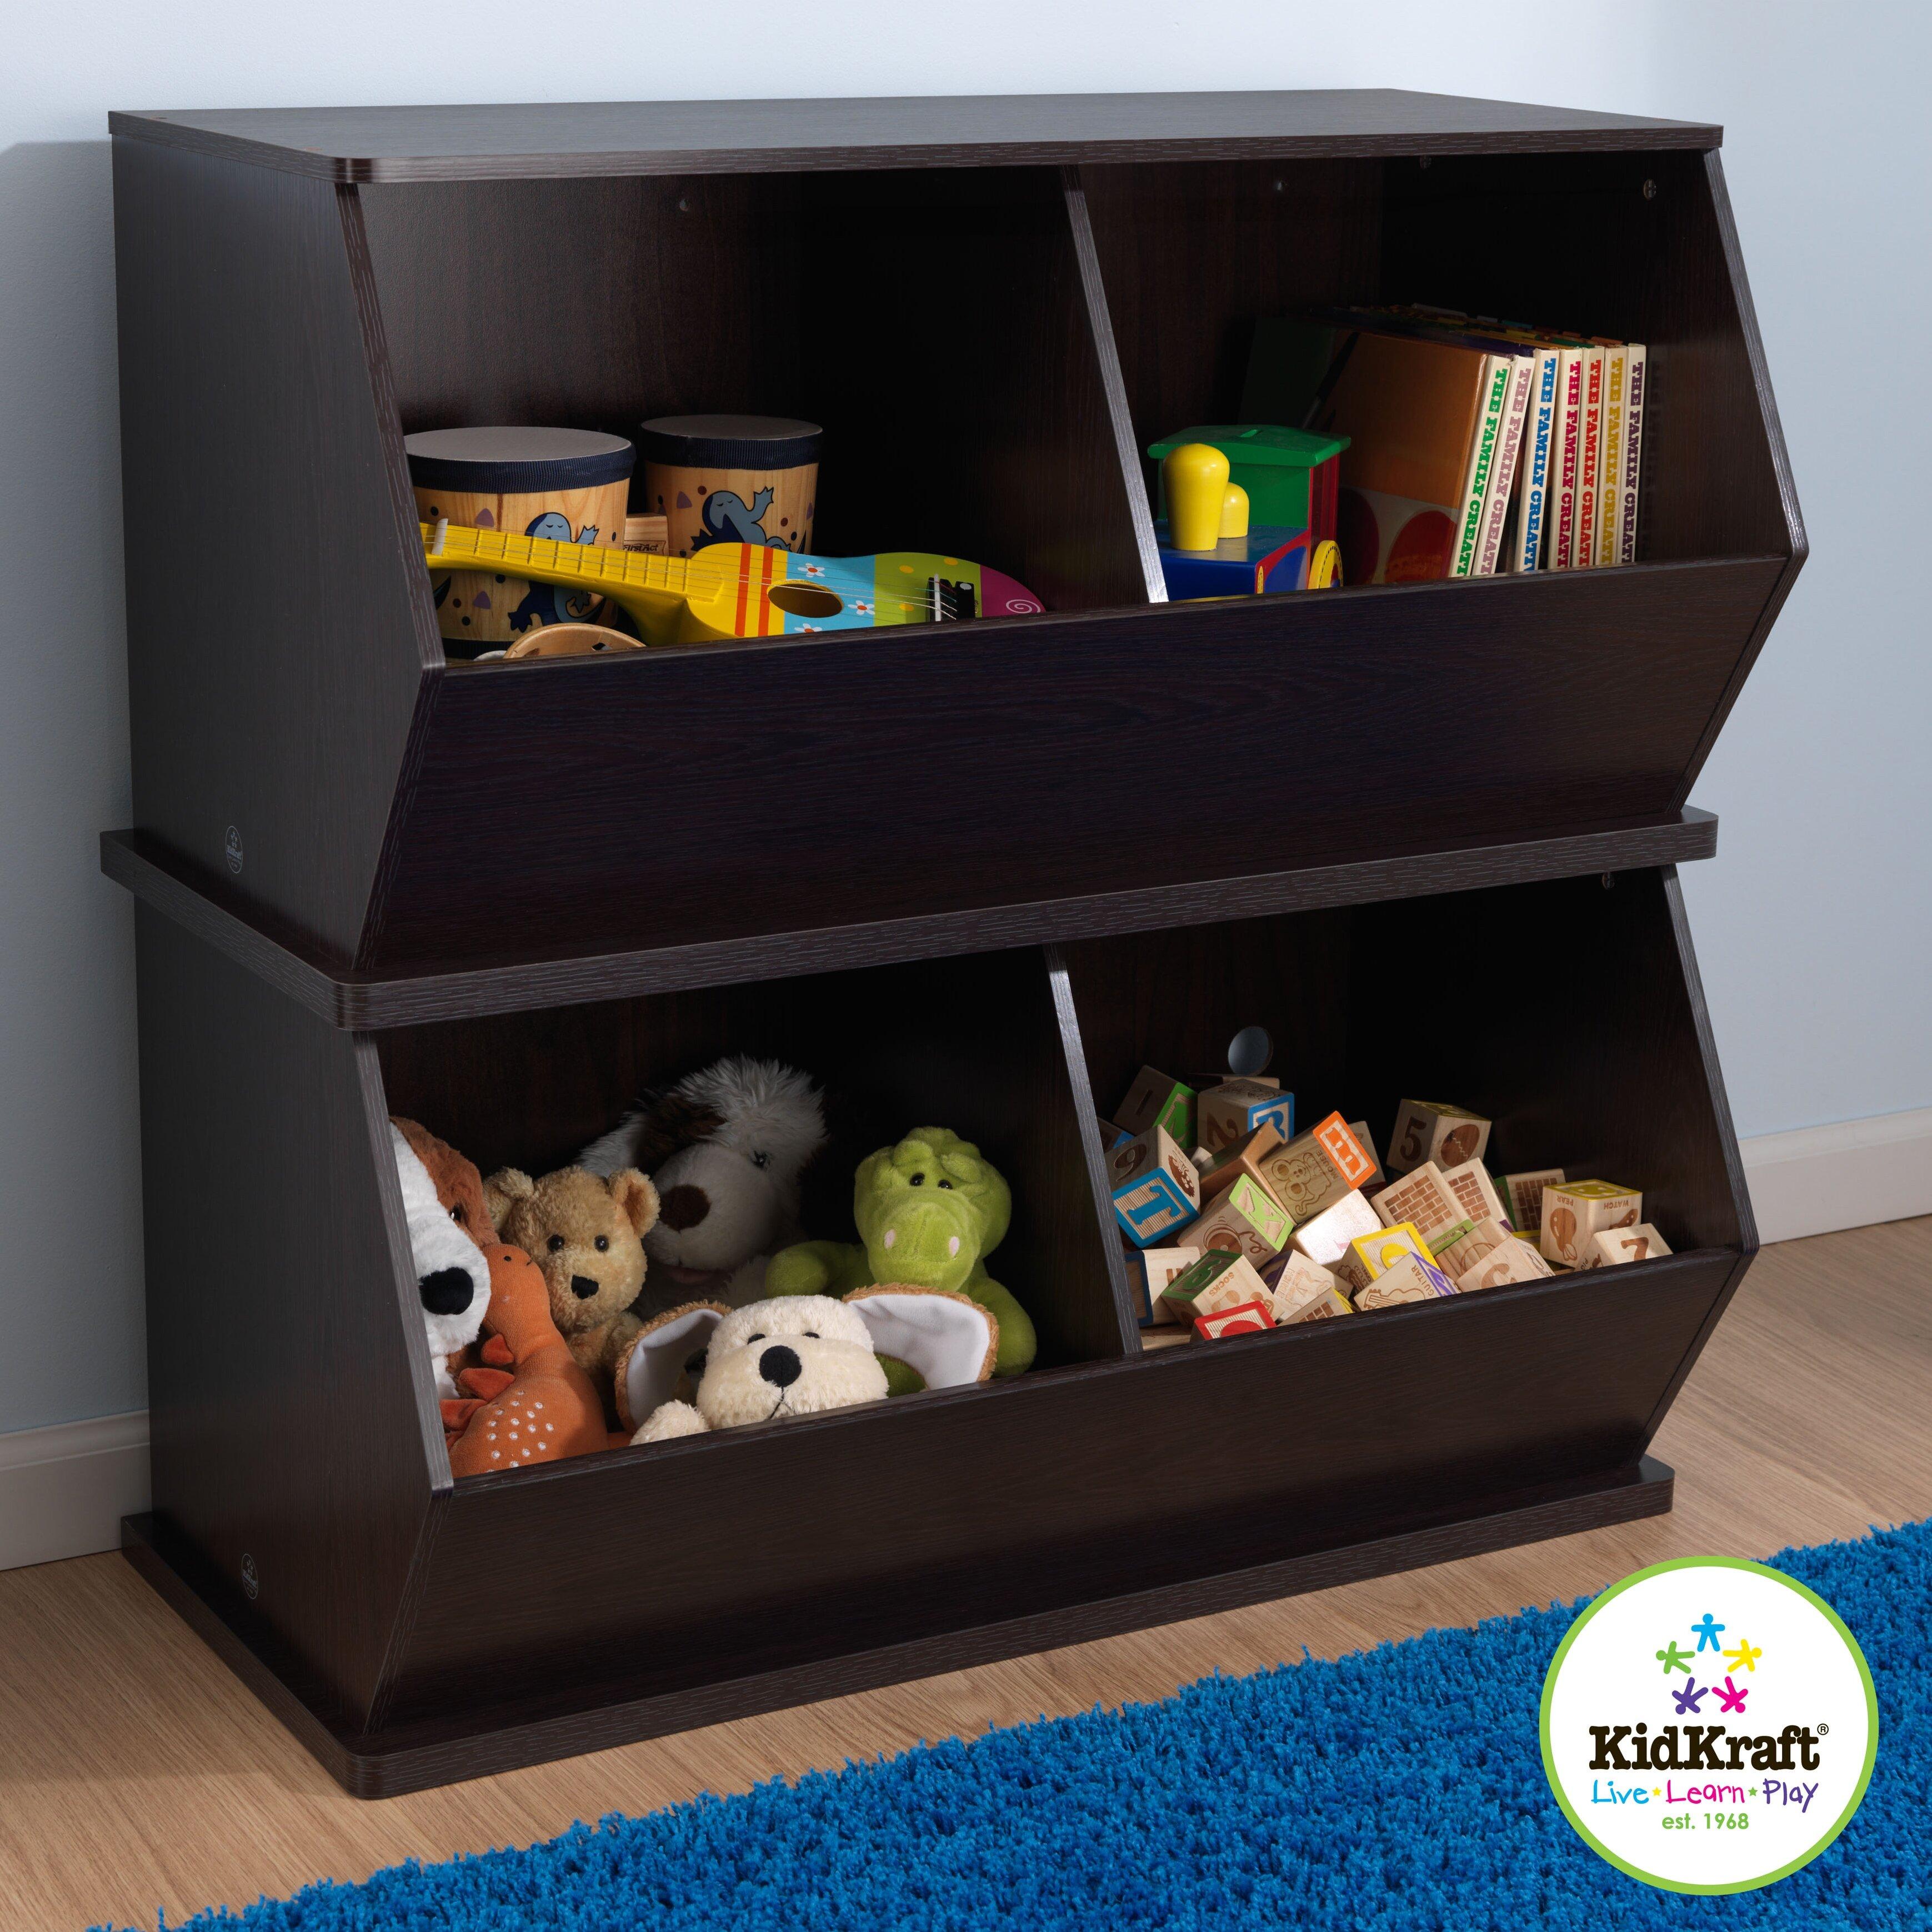 Childrens Kids 3 Tier Toy Bedroom Storage Shelf Unit 8: KidKraft Double Storage Unit & Reviews